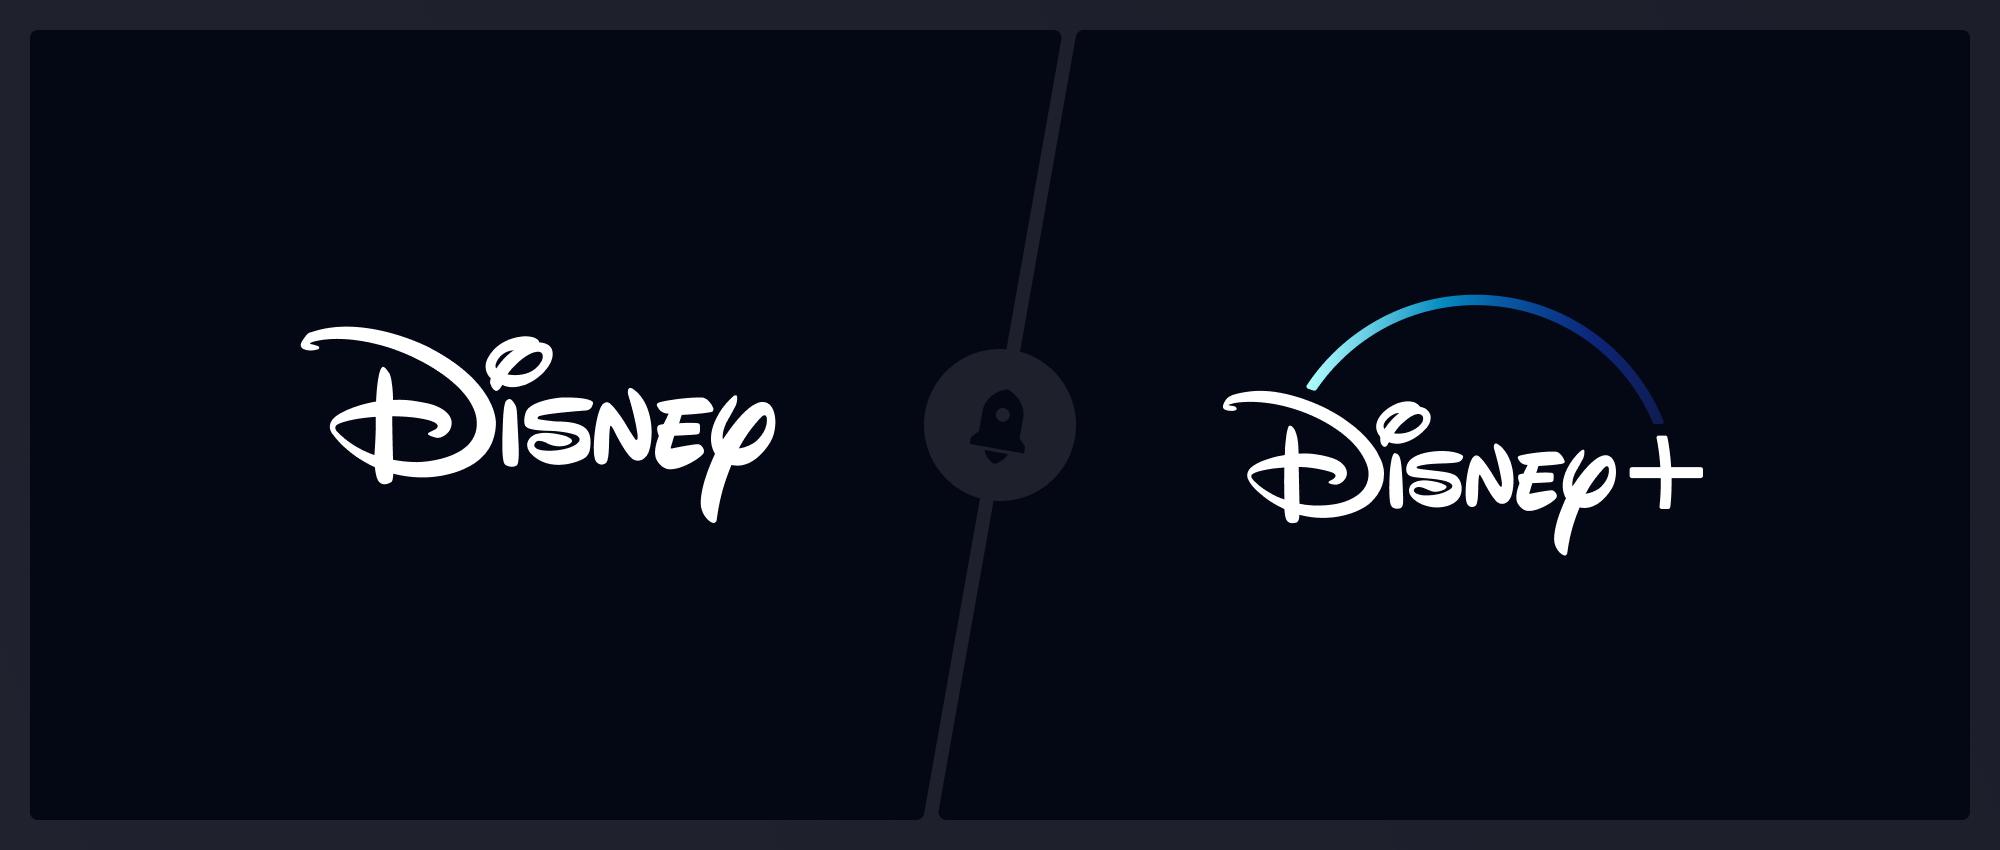 Disney+: An early winner of the D2C streaming wars.